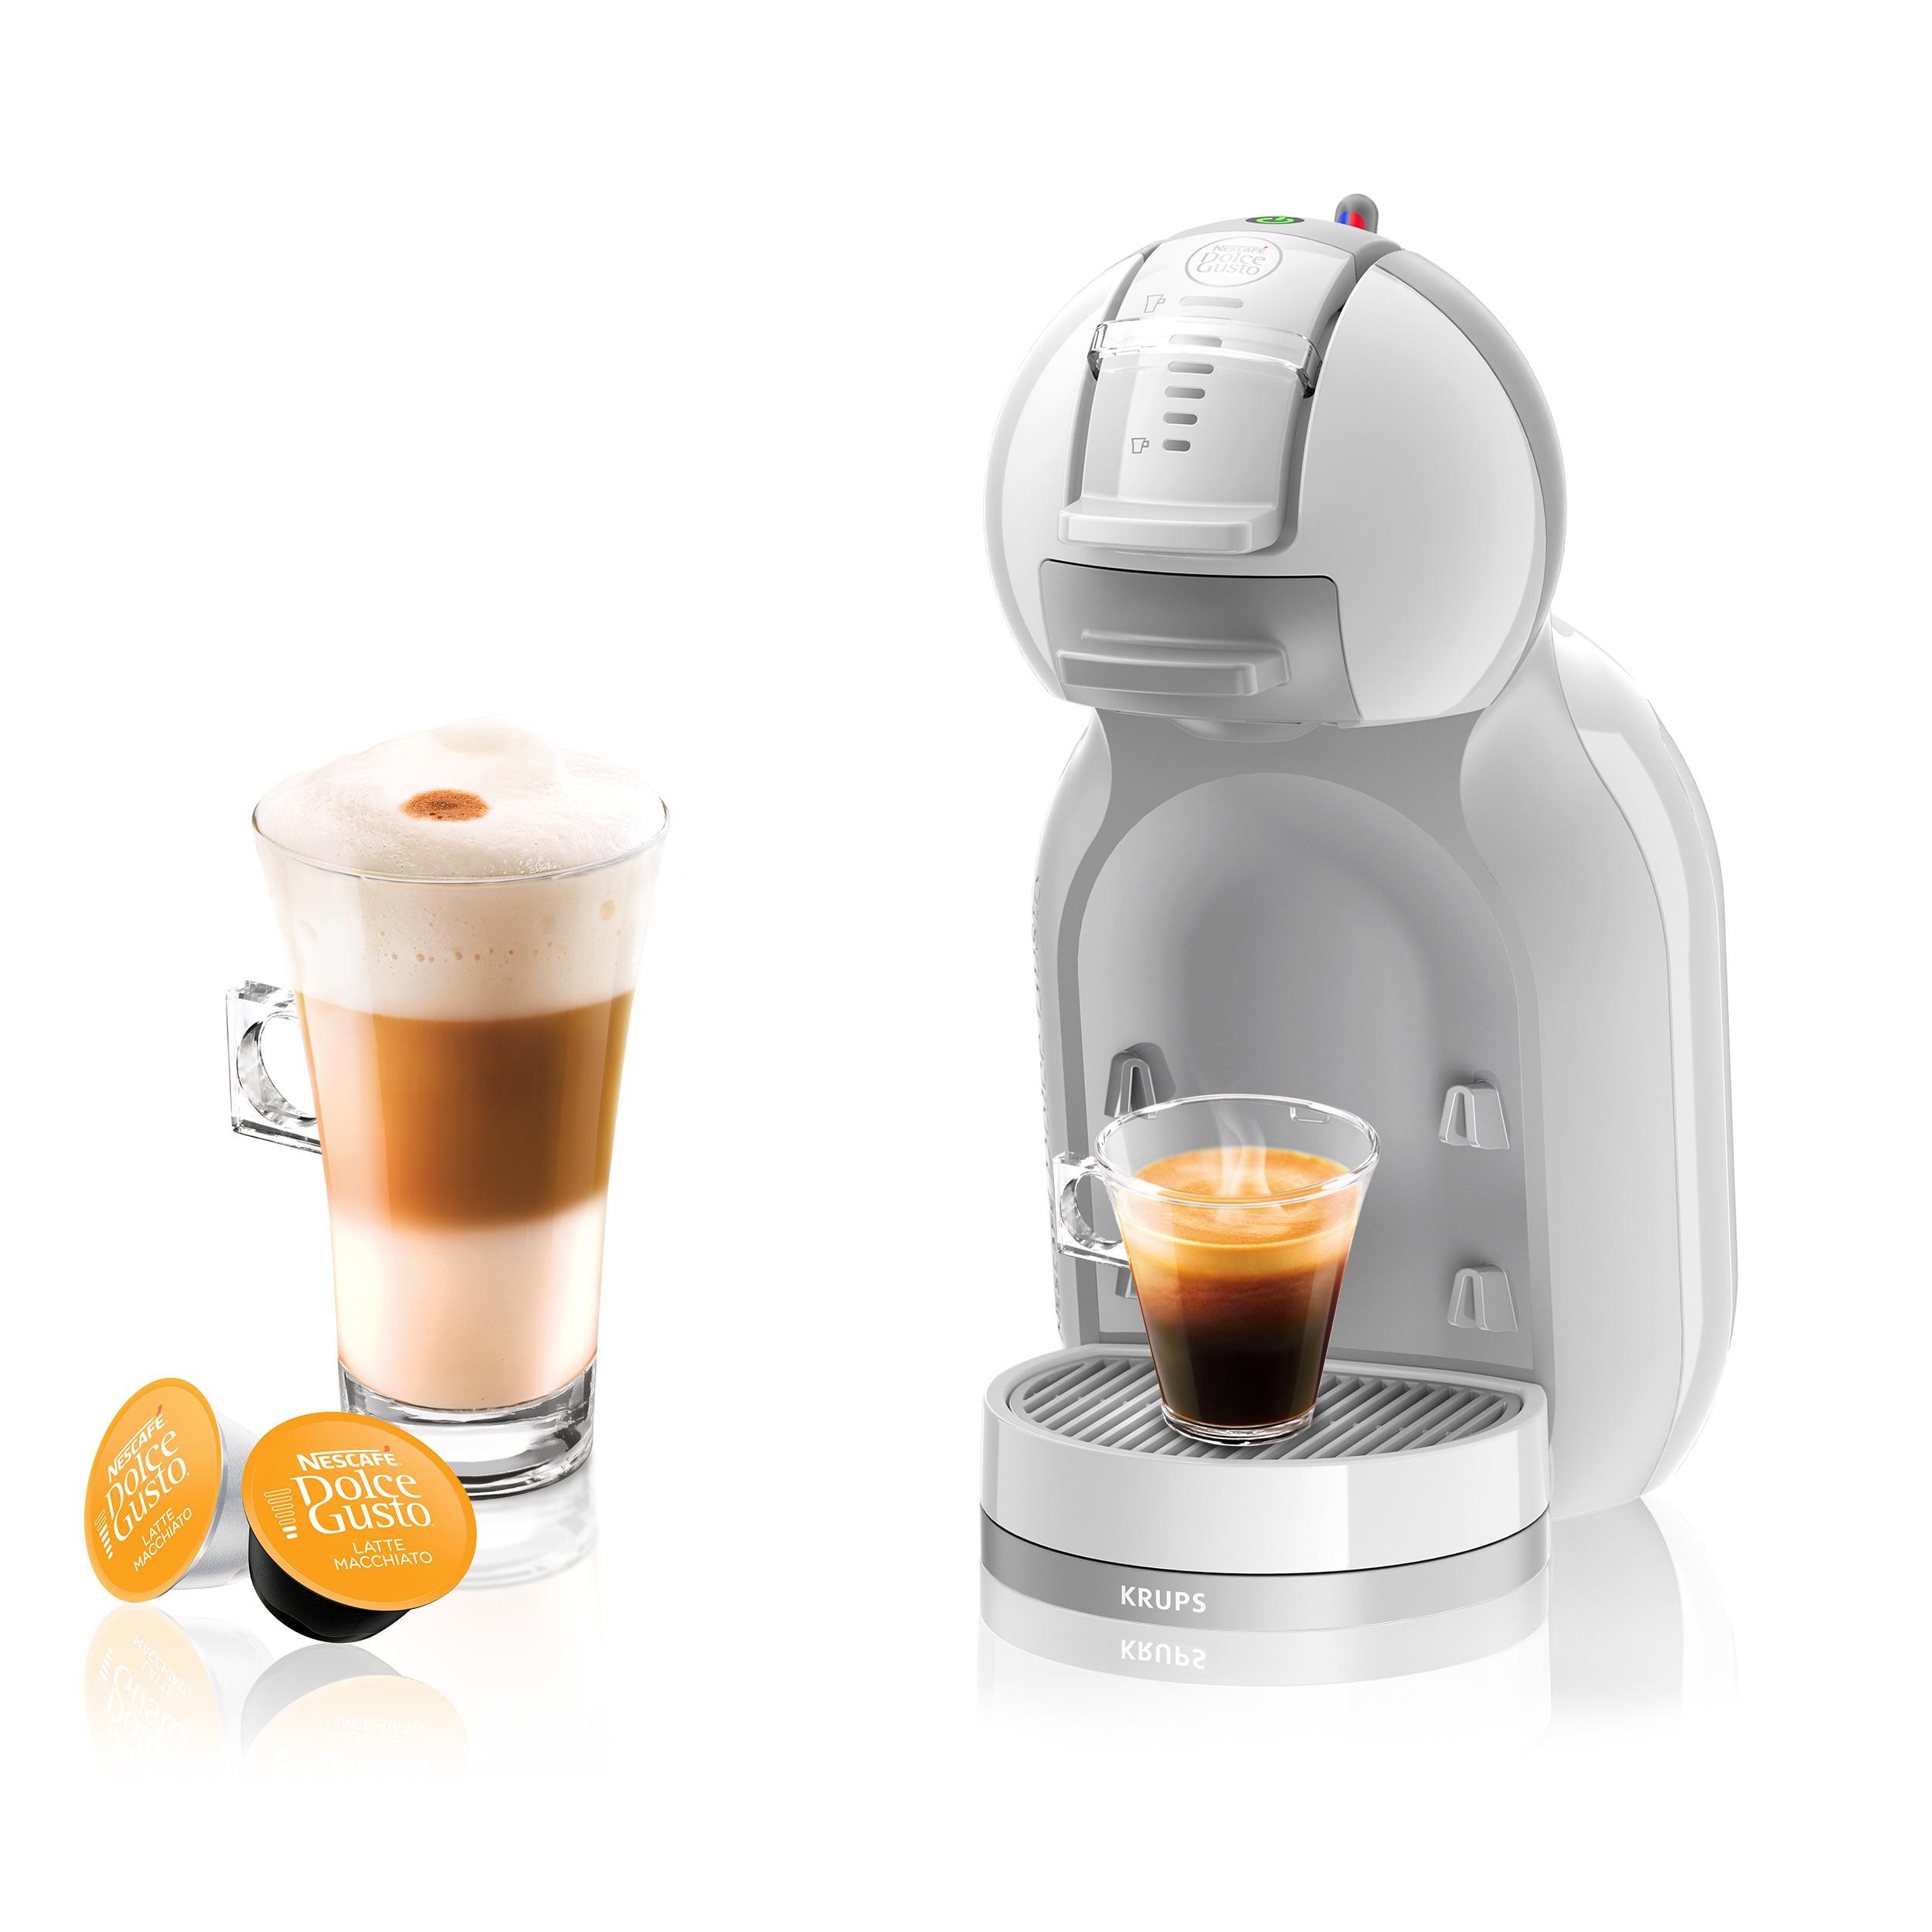 Krups KP1201 Dolce Gusto Mini Me Espresso apparaat